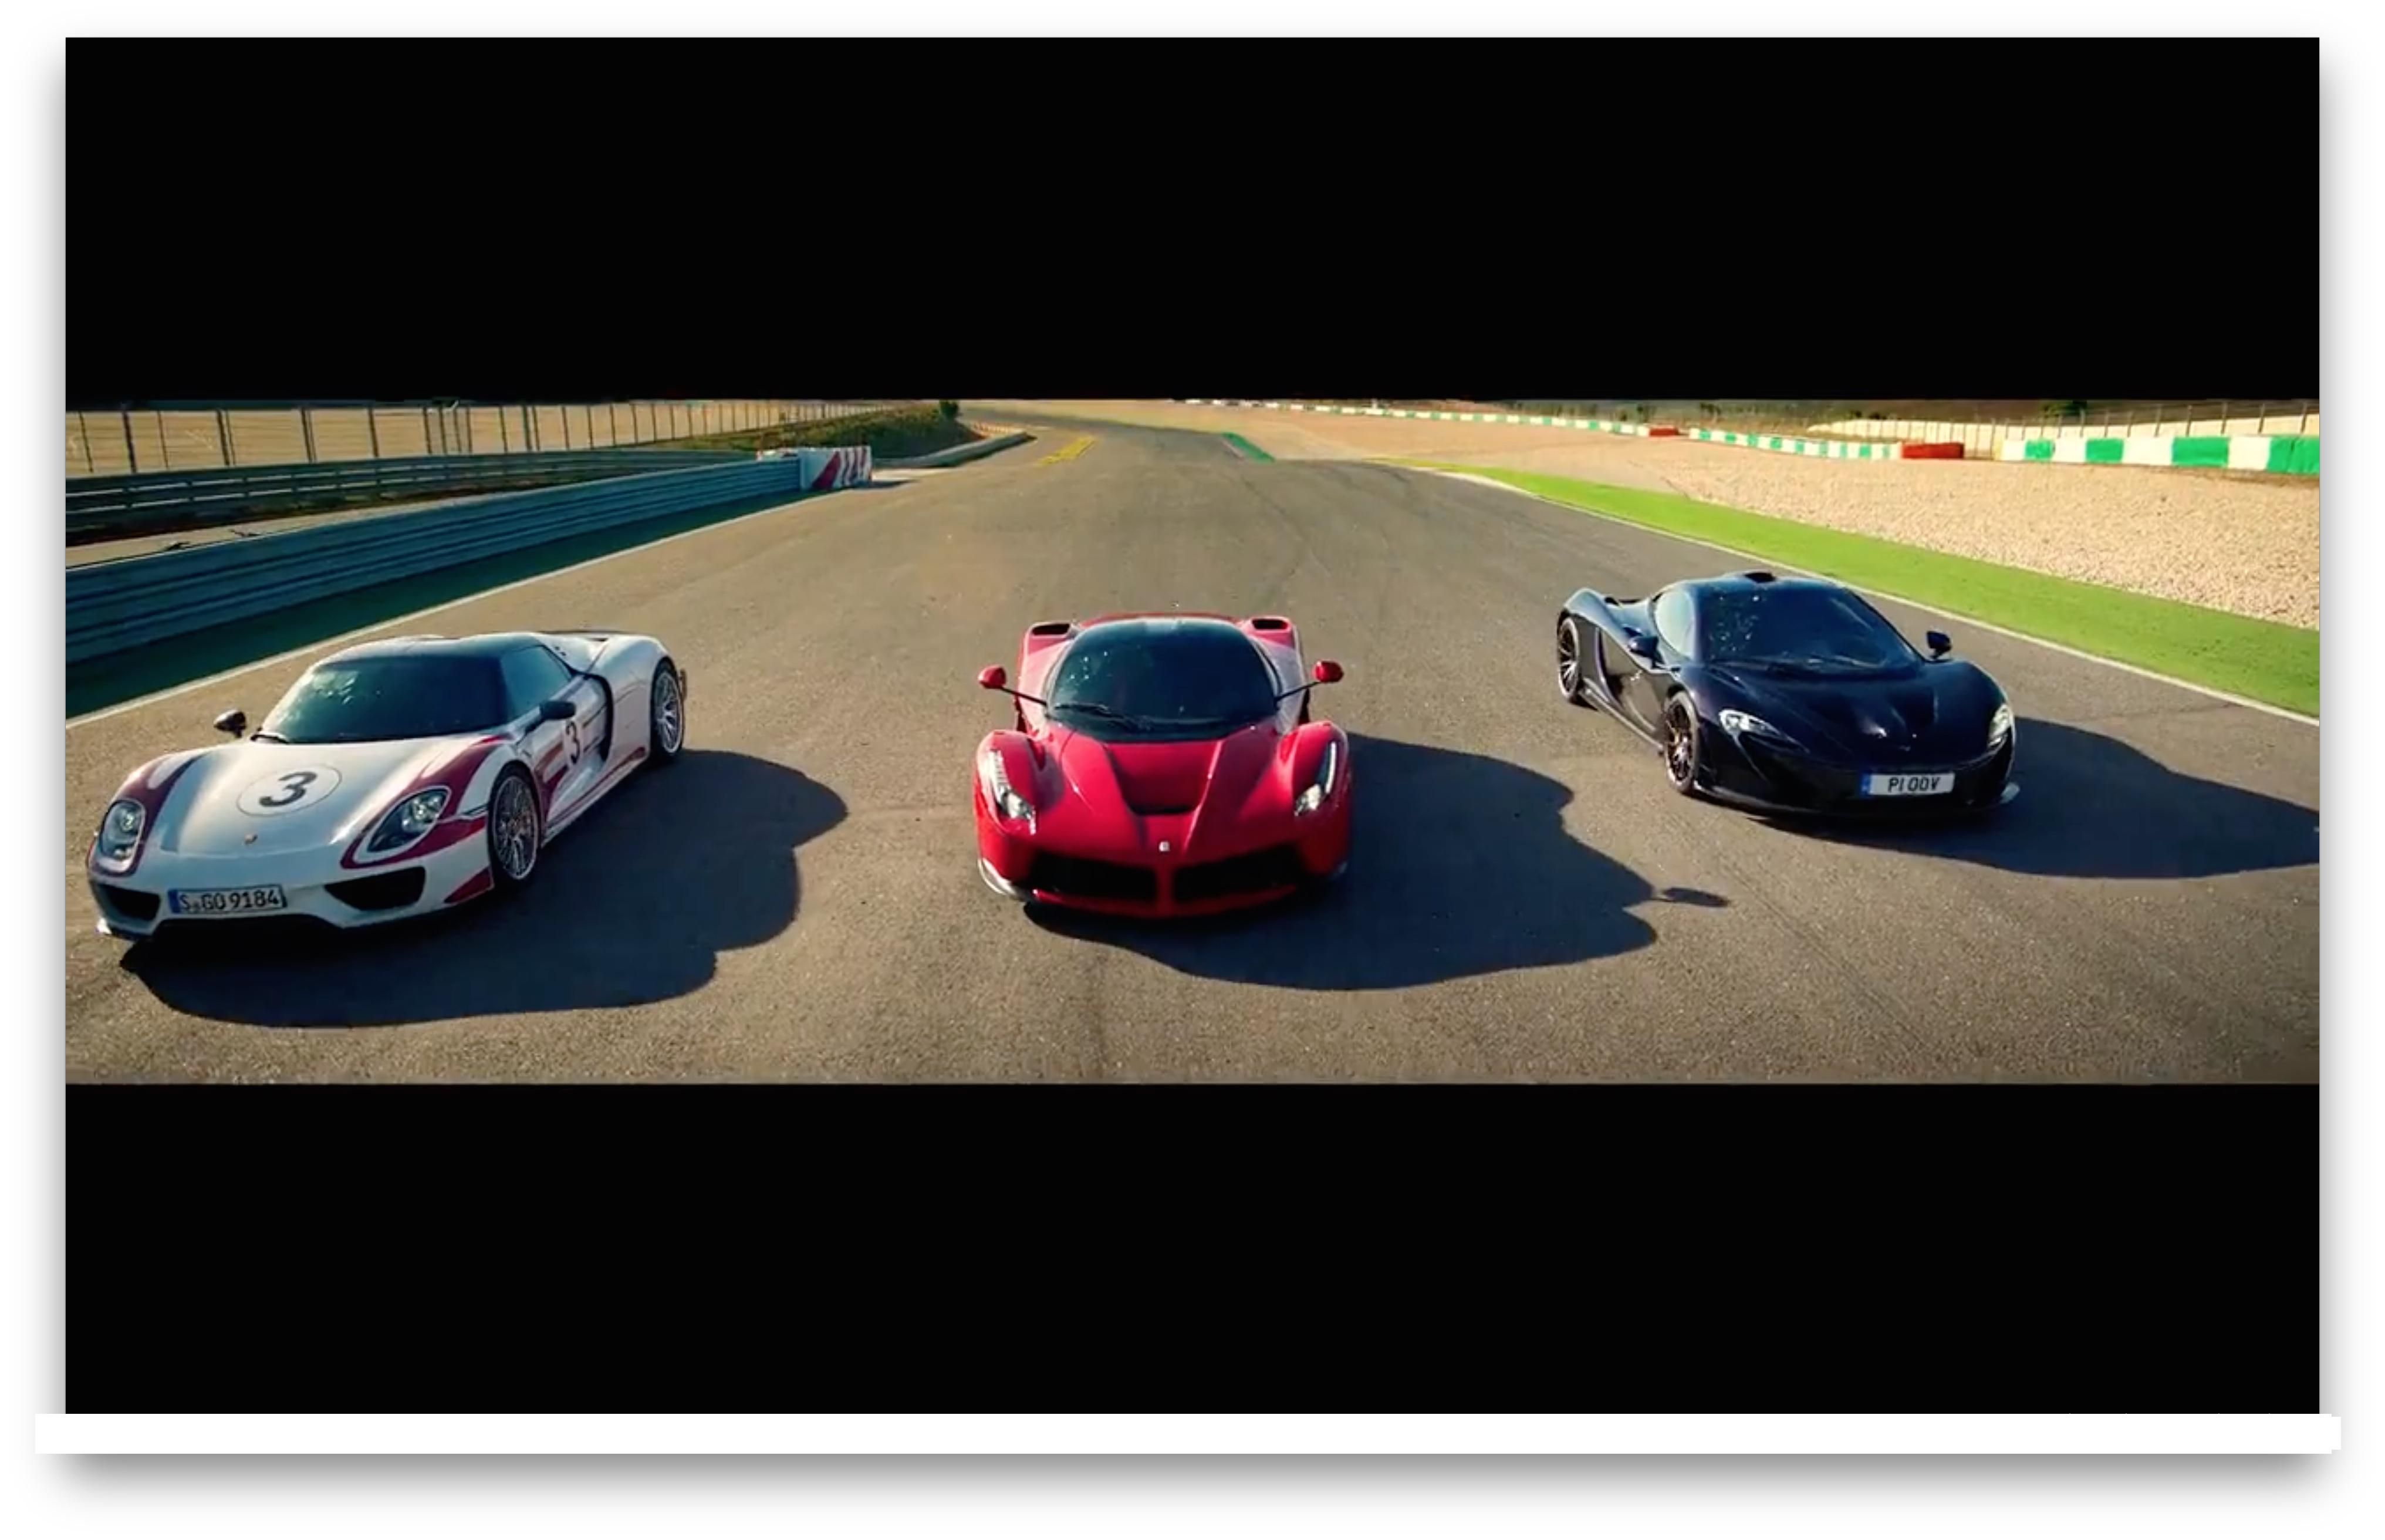 Screen shot of a Porsche, Ferrari and a Maclaren P1